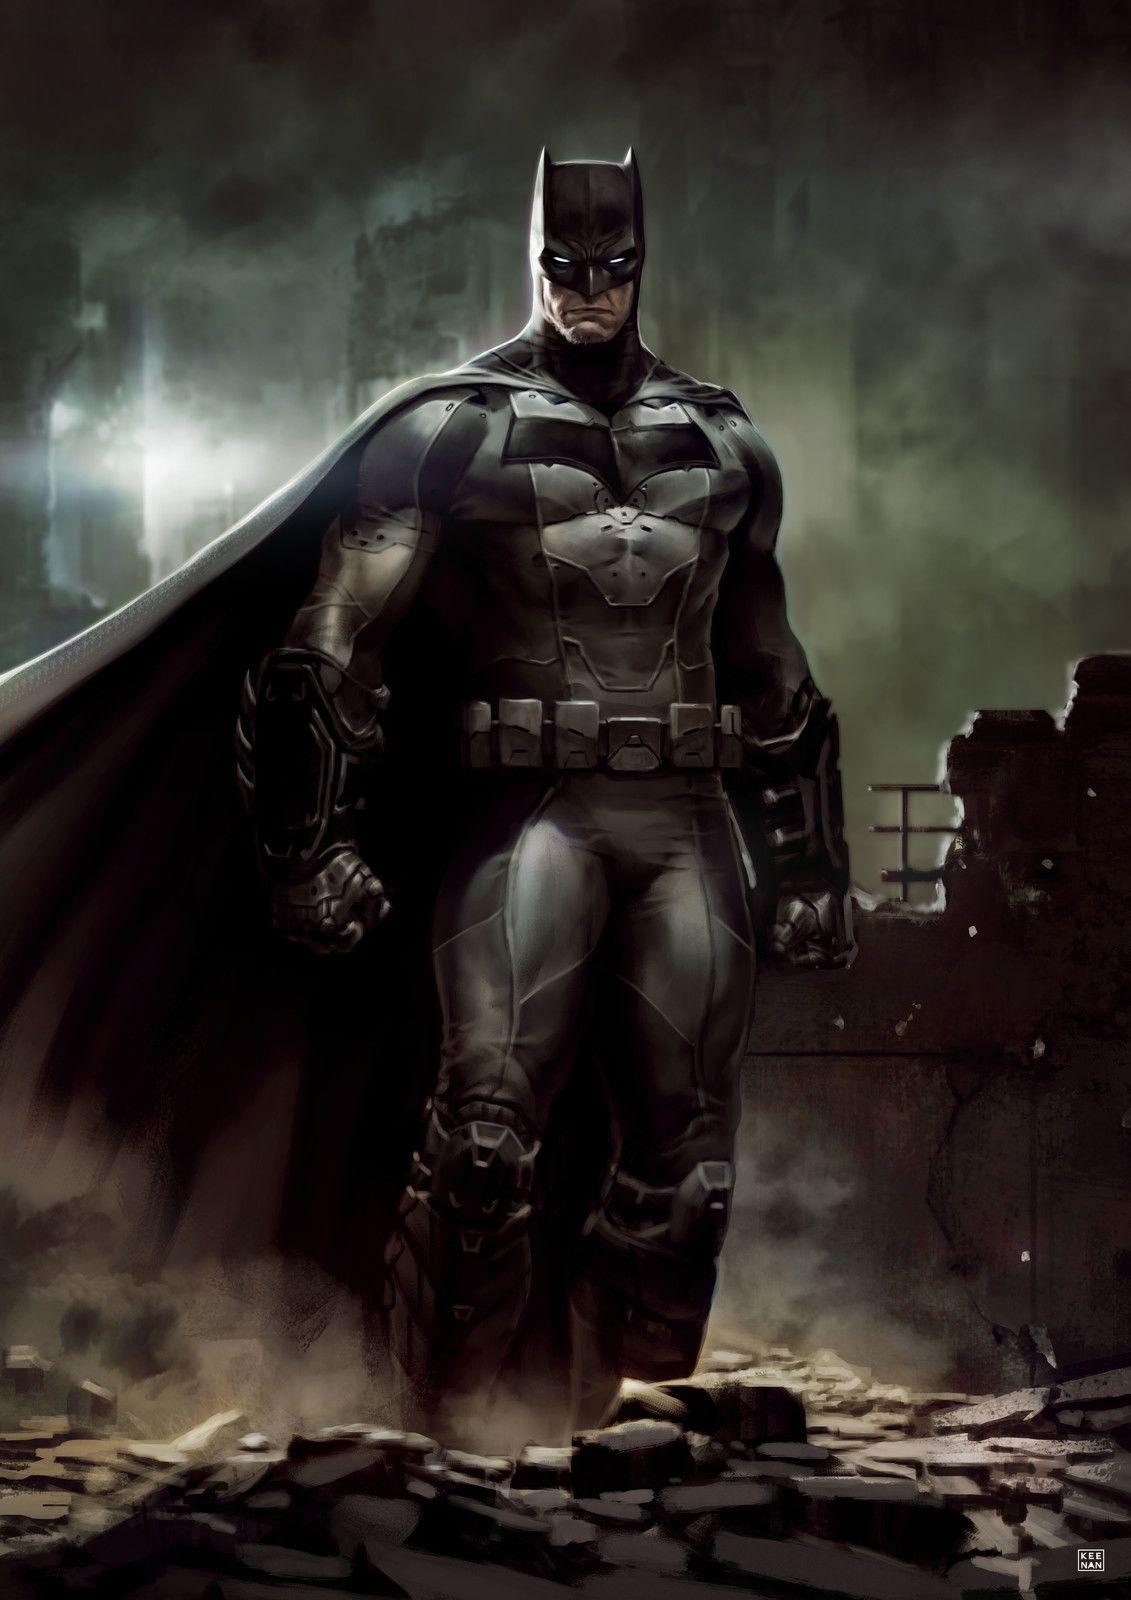 The Dark Knight: Gotham's Doom, Dave Keenan on ArtStation at https://www.artstation.com/artwork/1BwG2